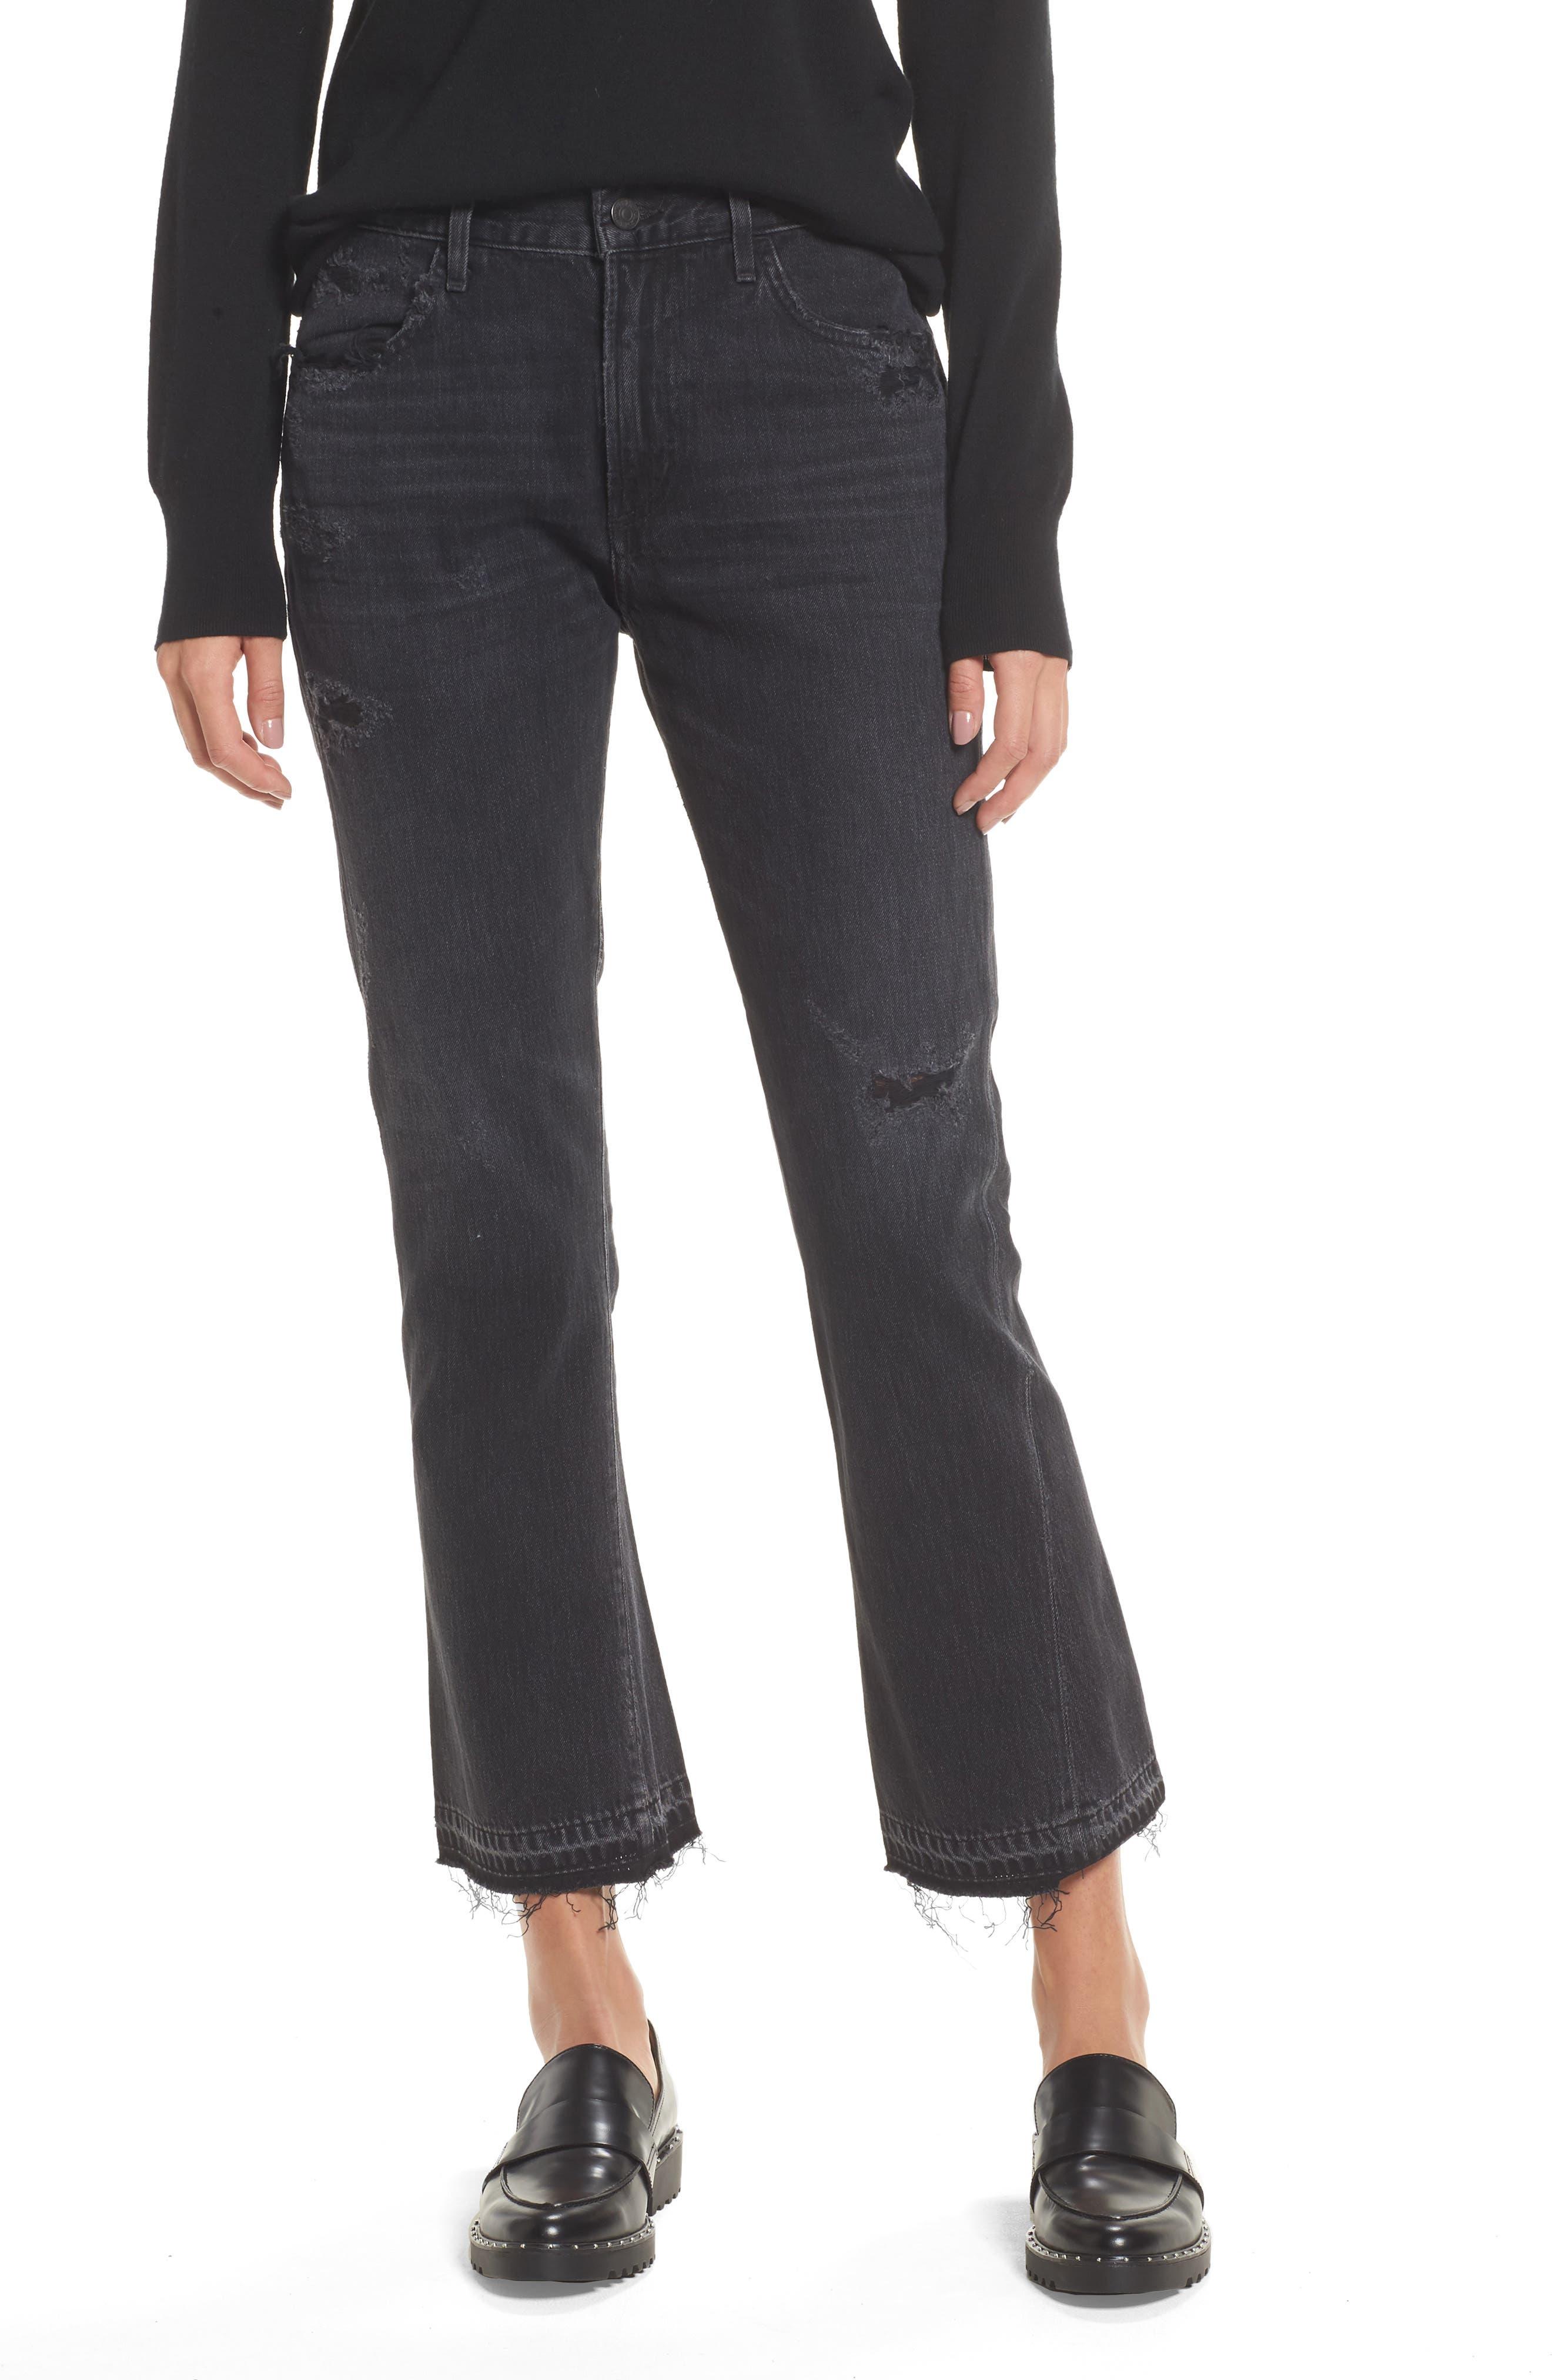 Main Image - Citizens of Humanity Sasha Twist Crop Jeans (Black Hawk)